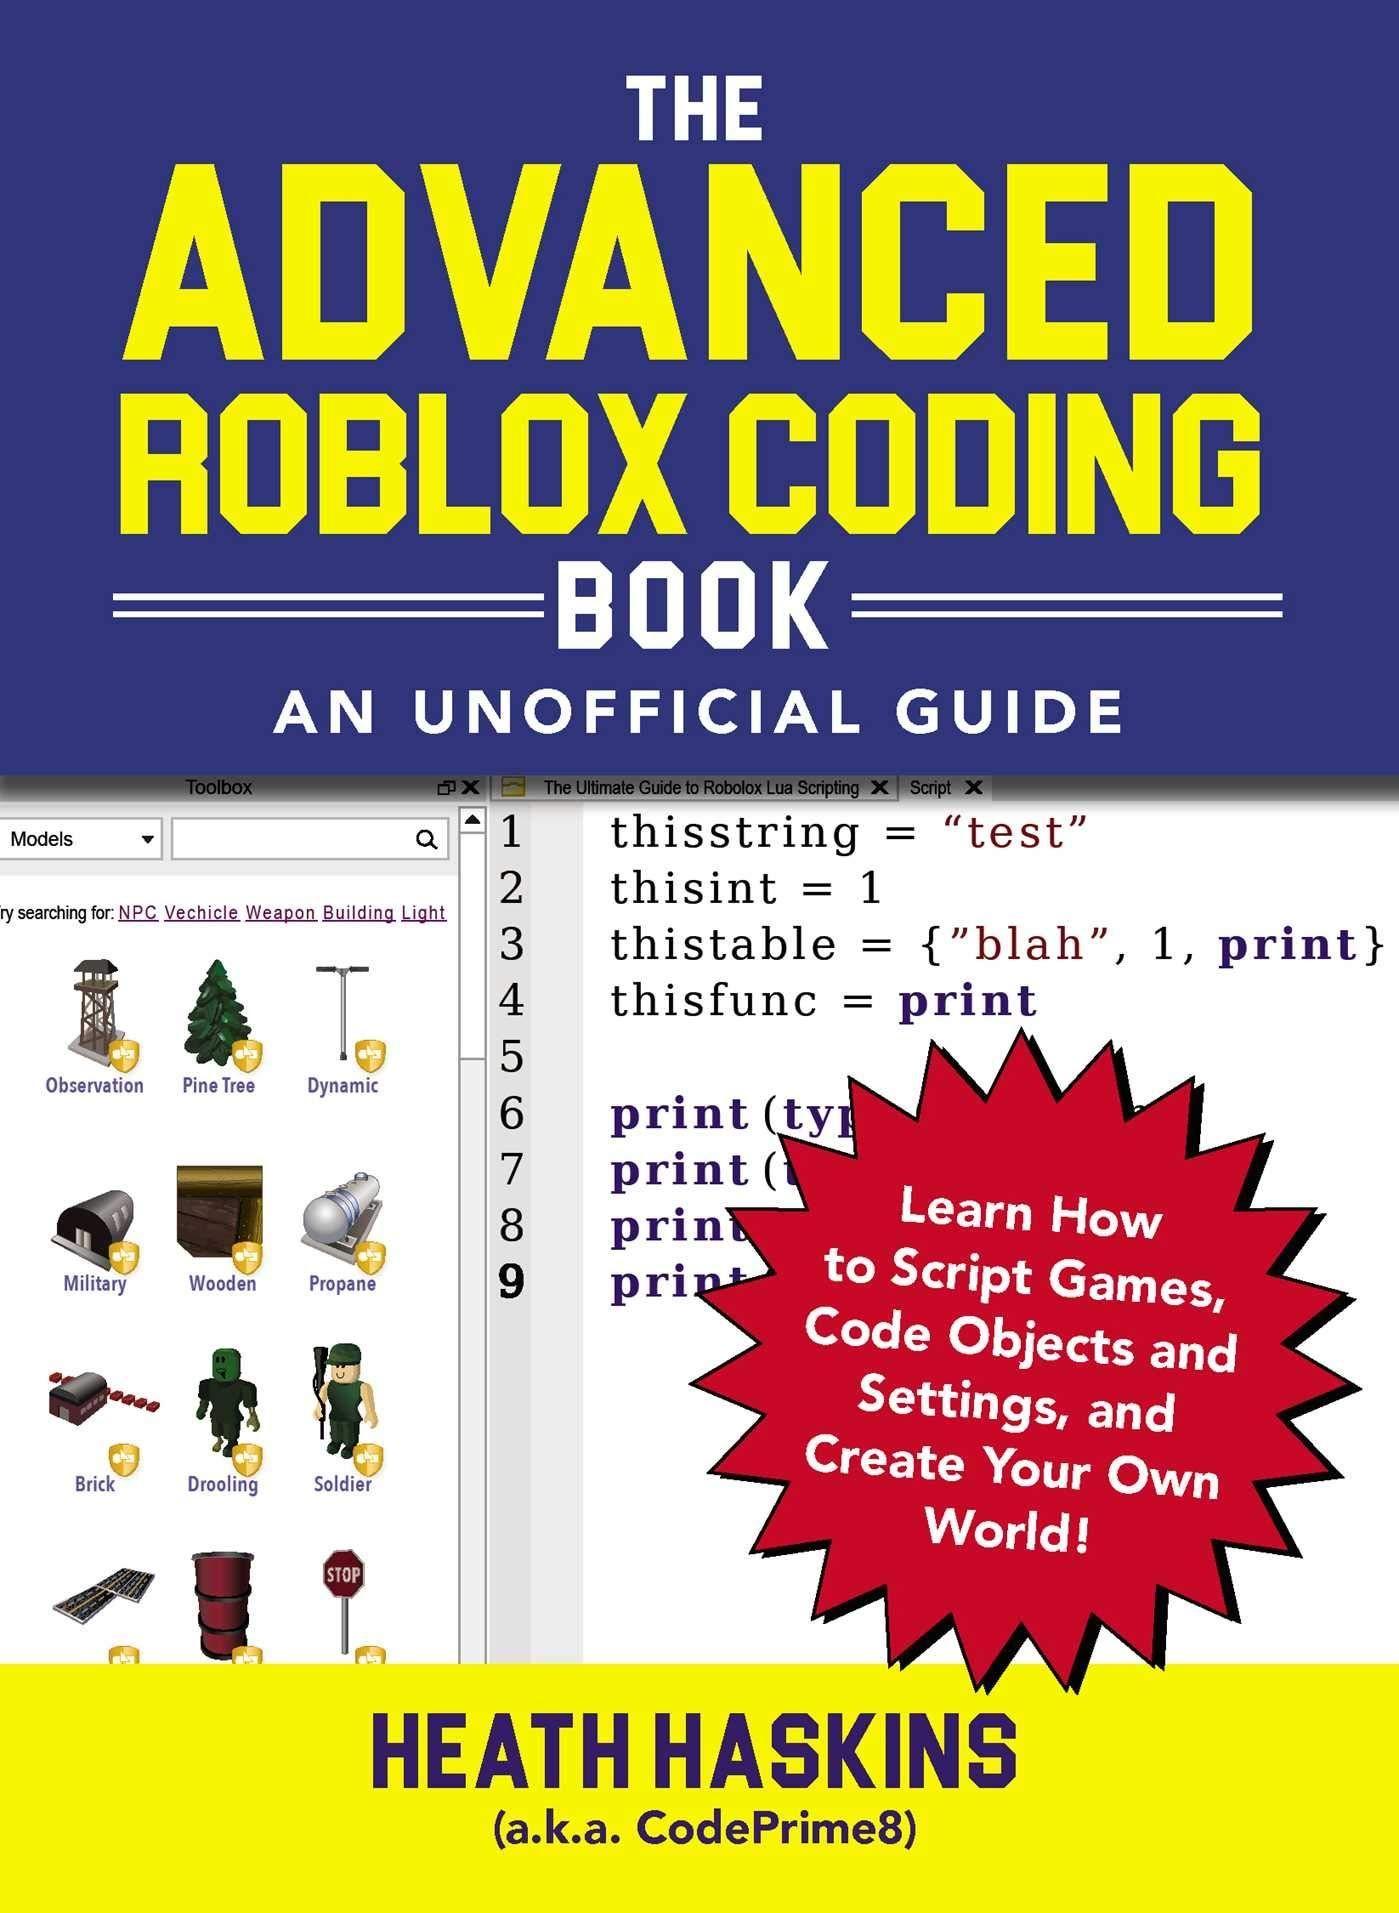 [PDF] DOWNLOAD The Advanced Roblox Coding Book An